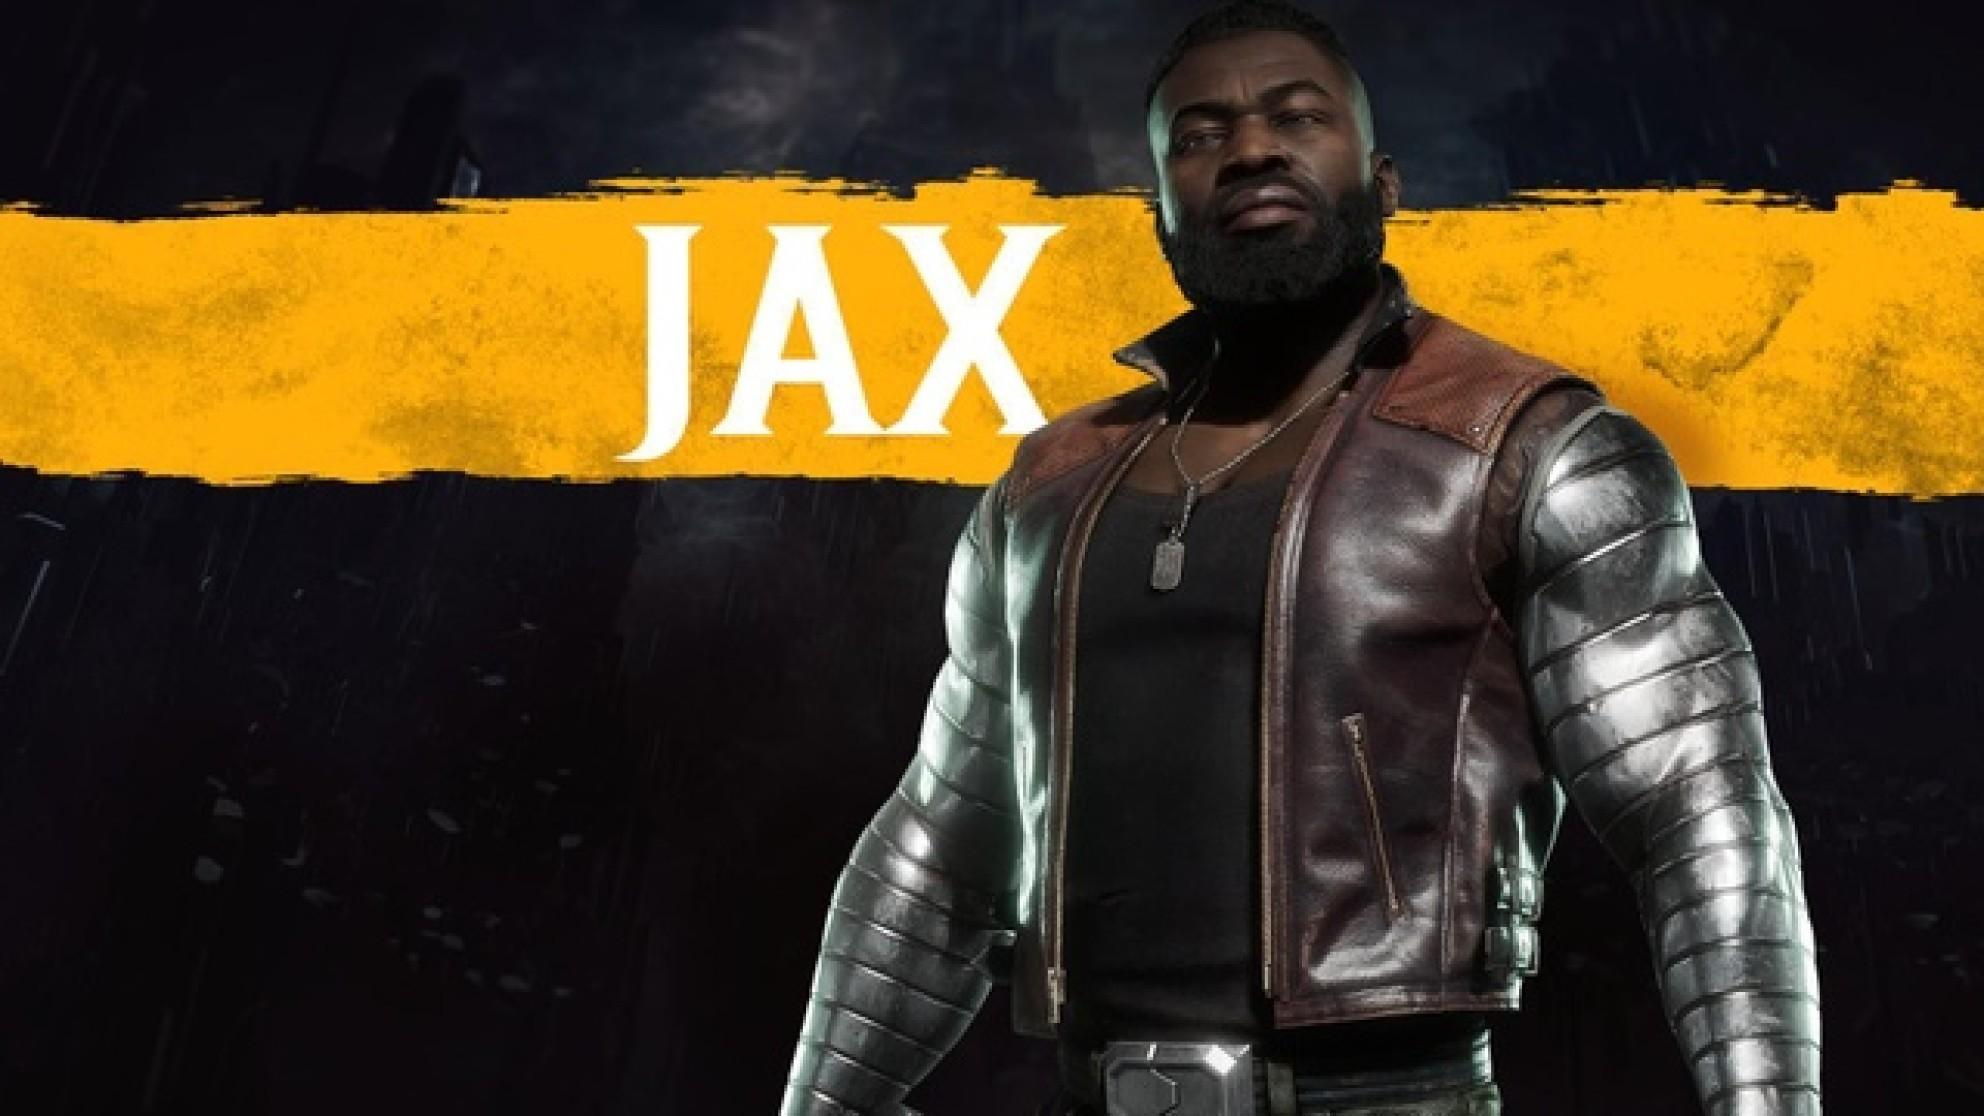 Фаталити Джакса из Mortal Kombat 11 воссоздали без бюджета. Эду Буну понравилось